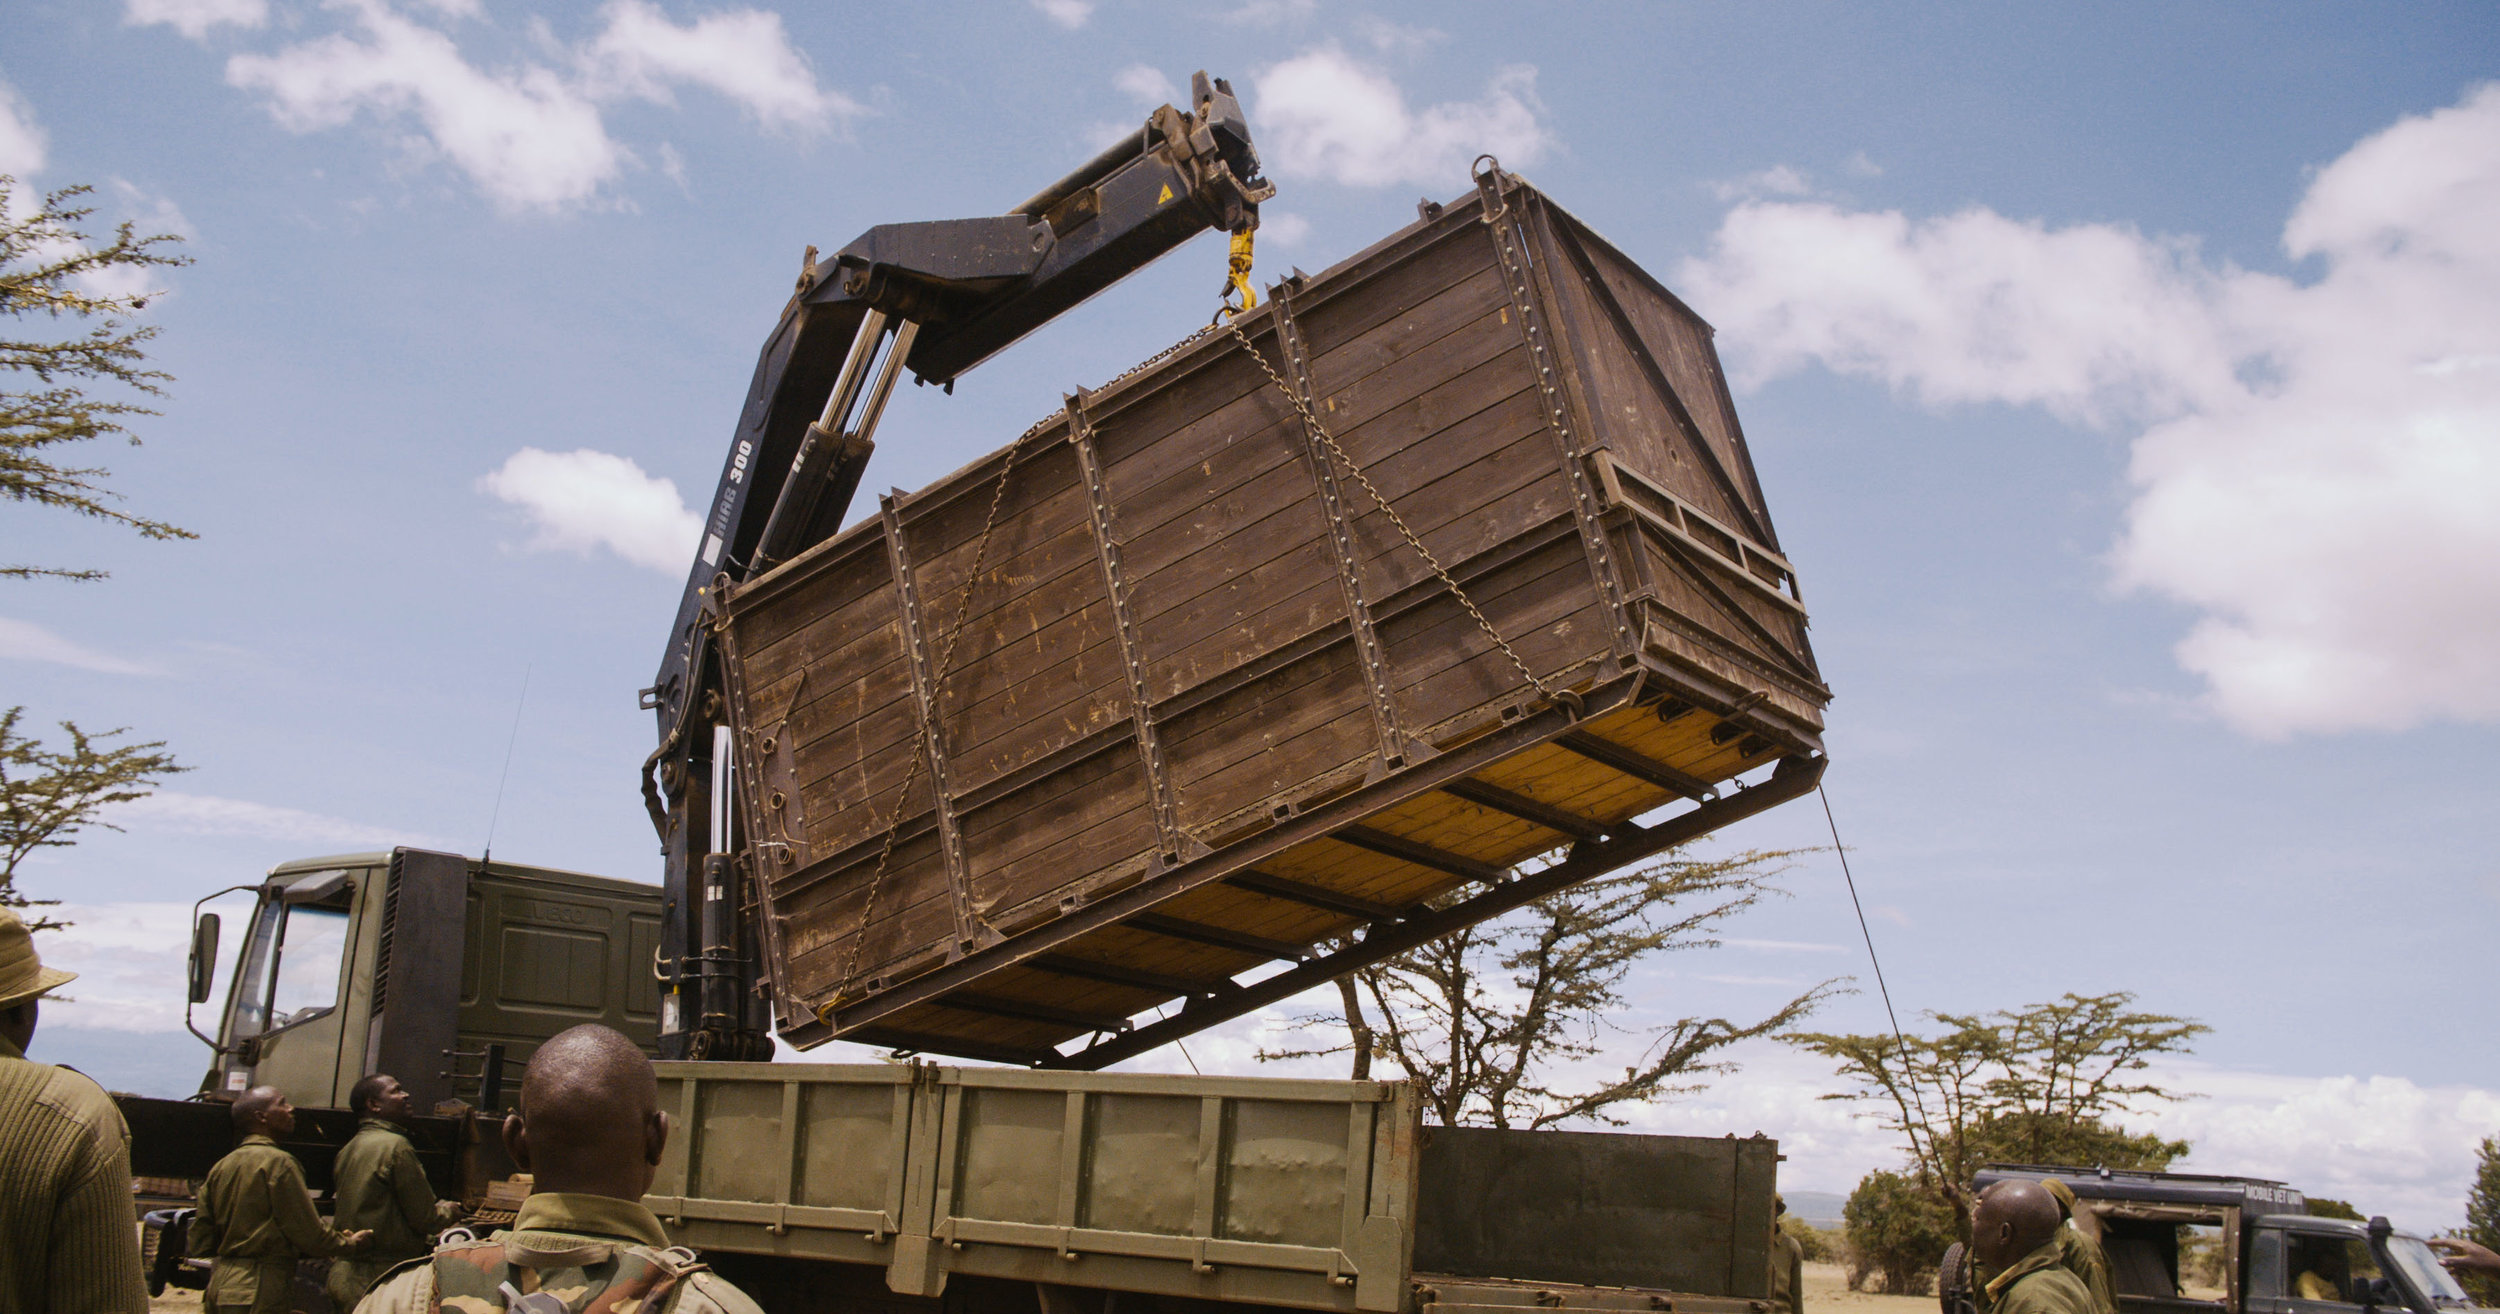 A rhino transfer at Ol Pejeta Conservancy in Kenya. Credit: David Hambridge